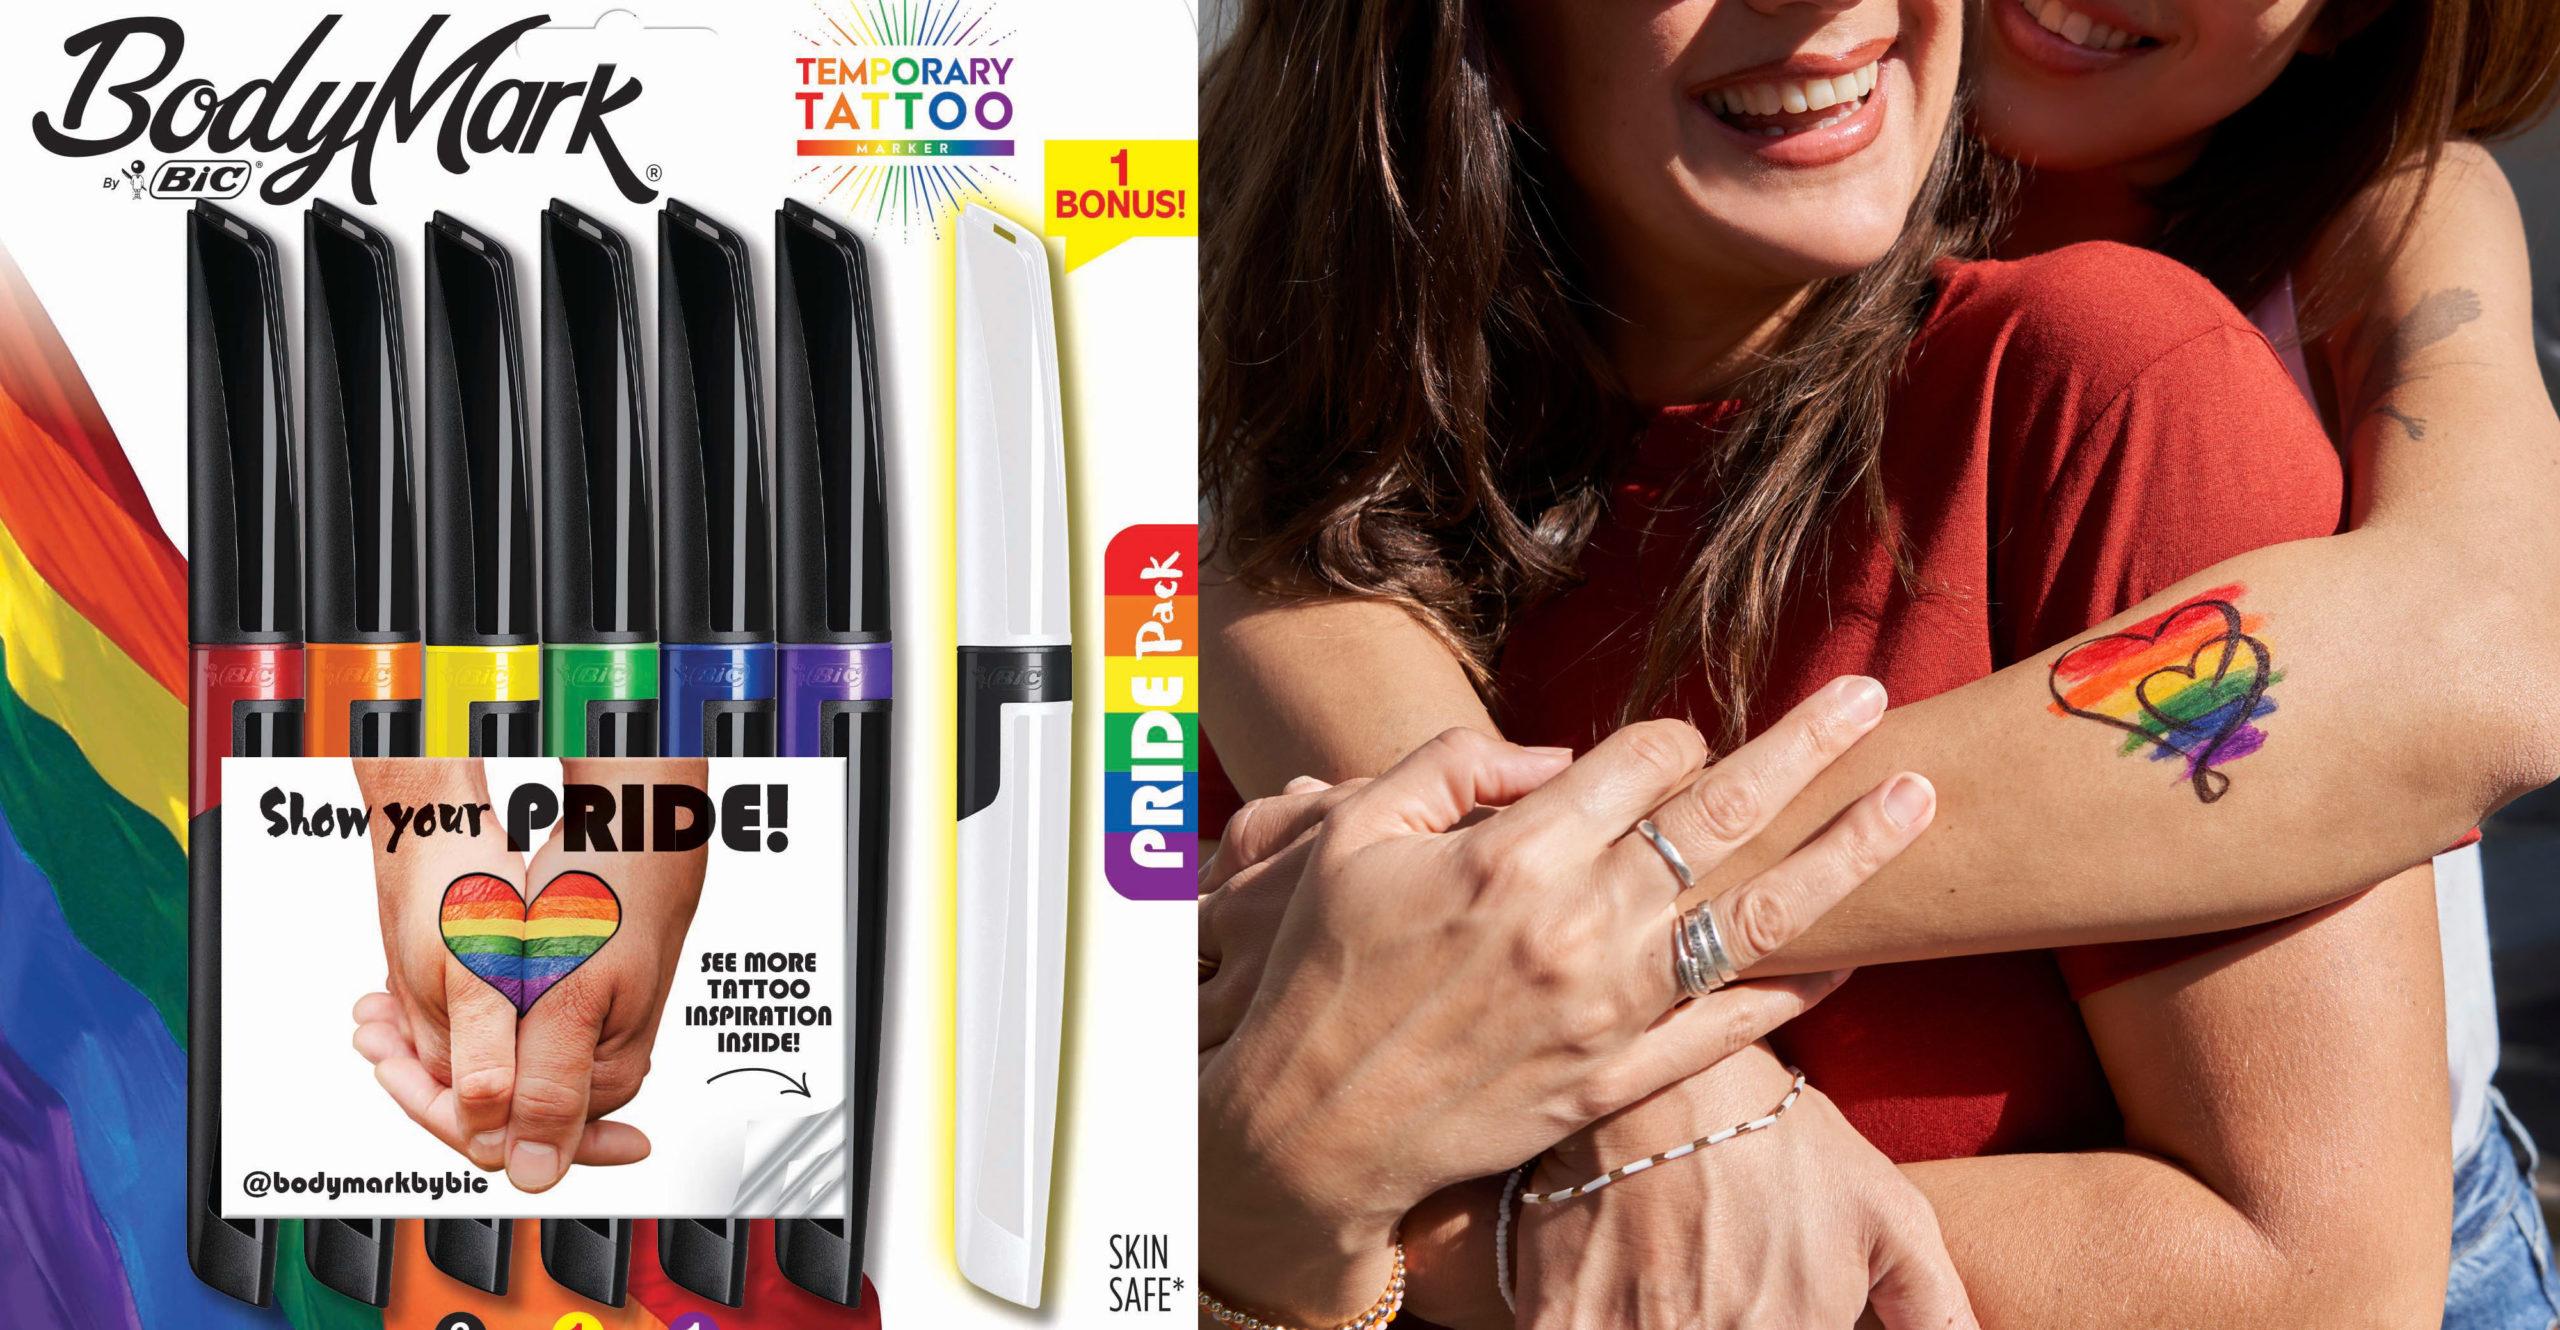 BodyMark by BIC Temporary Tattoo Markers